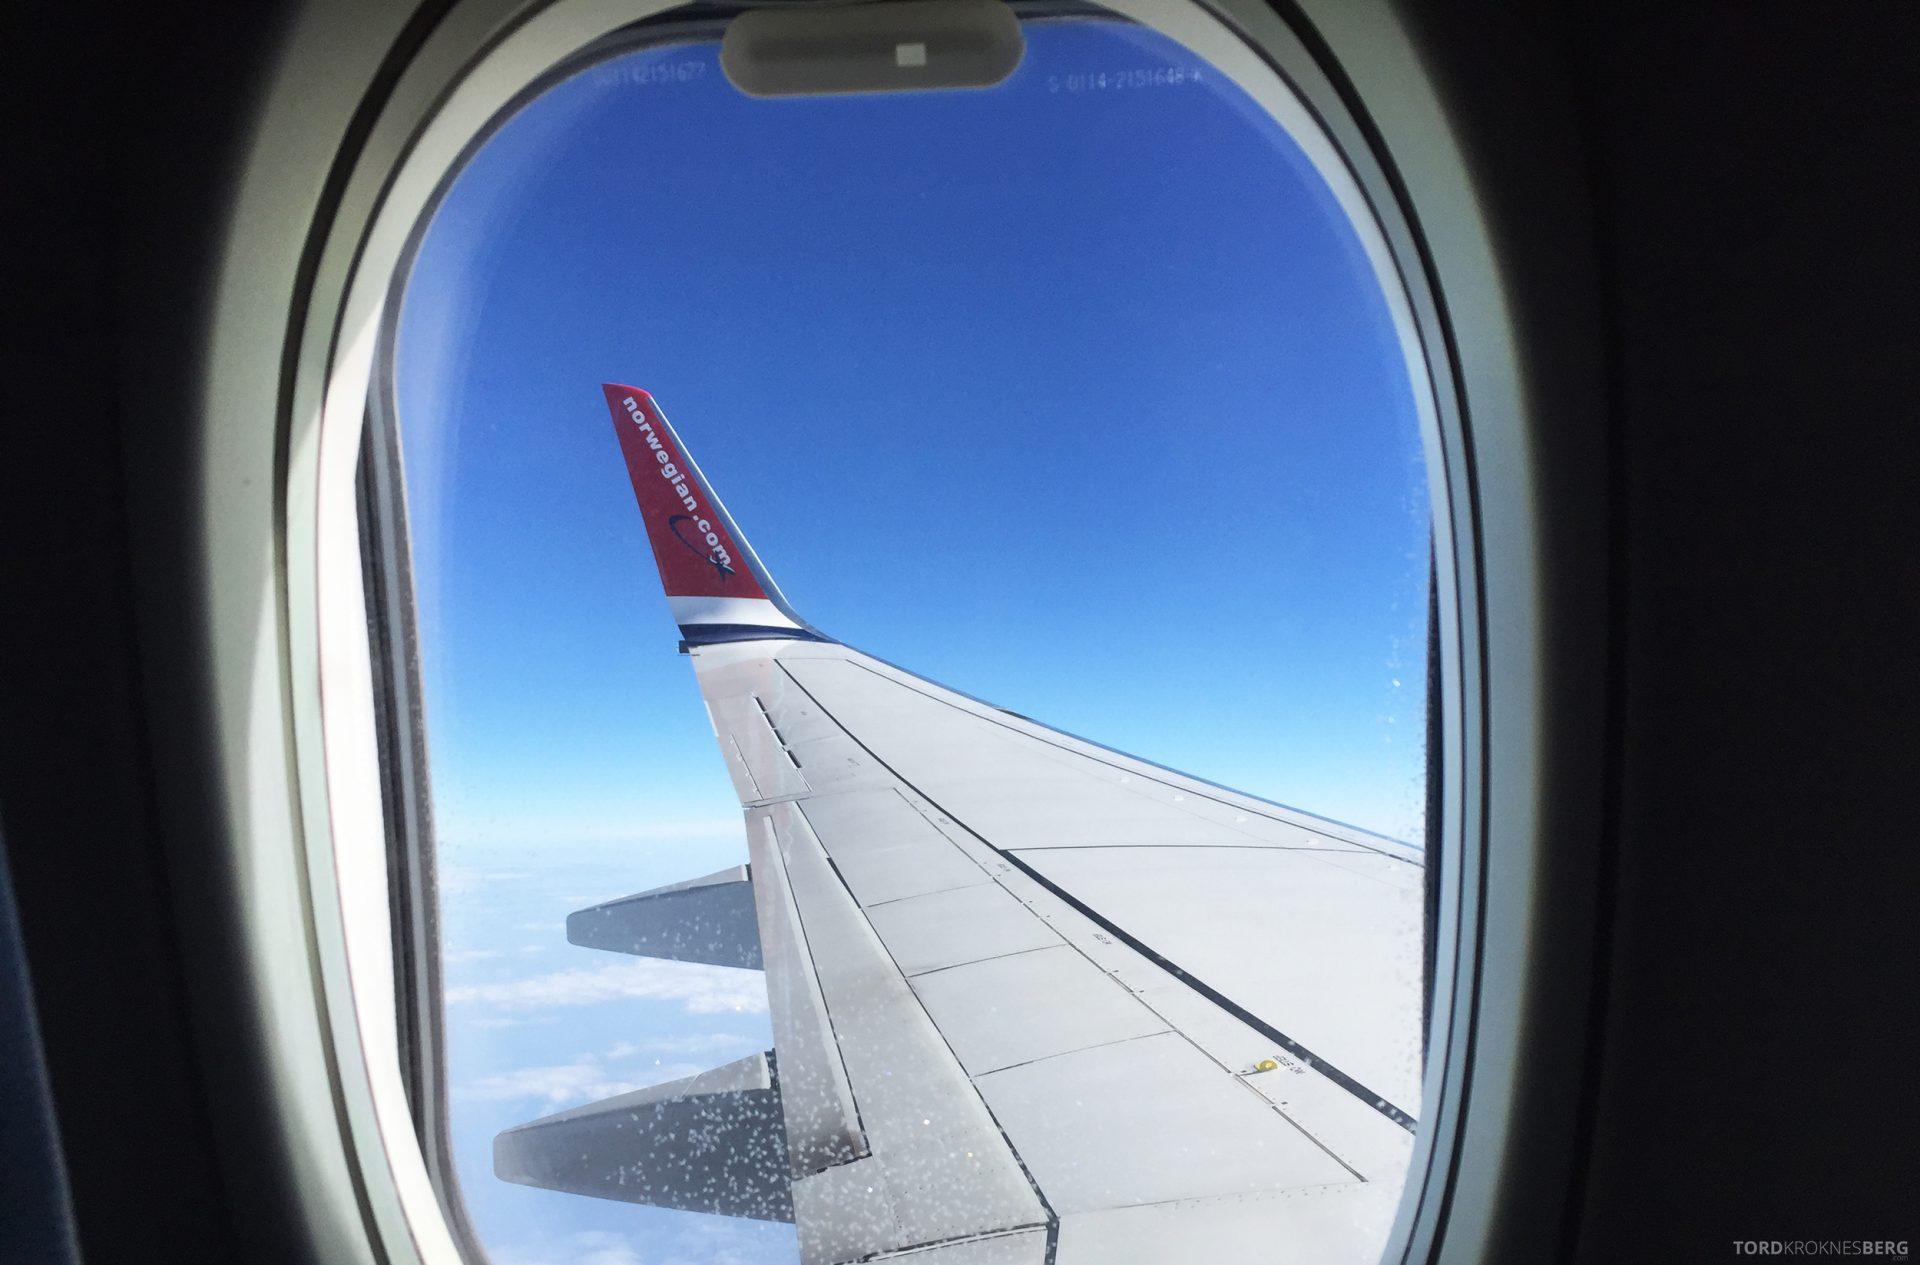 Norwegian Charter Trondheim Las Palmas